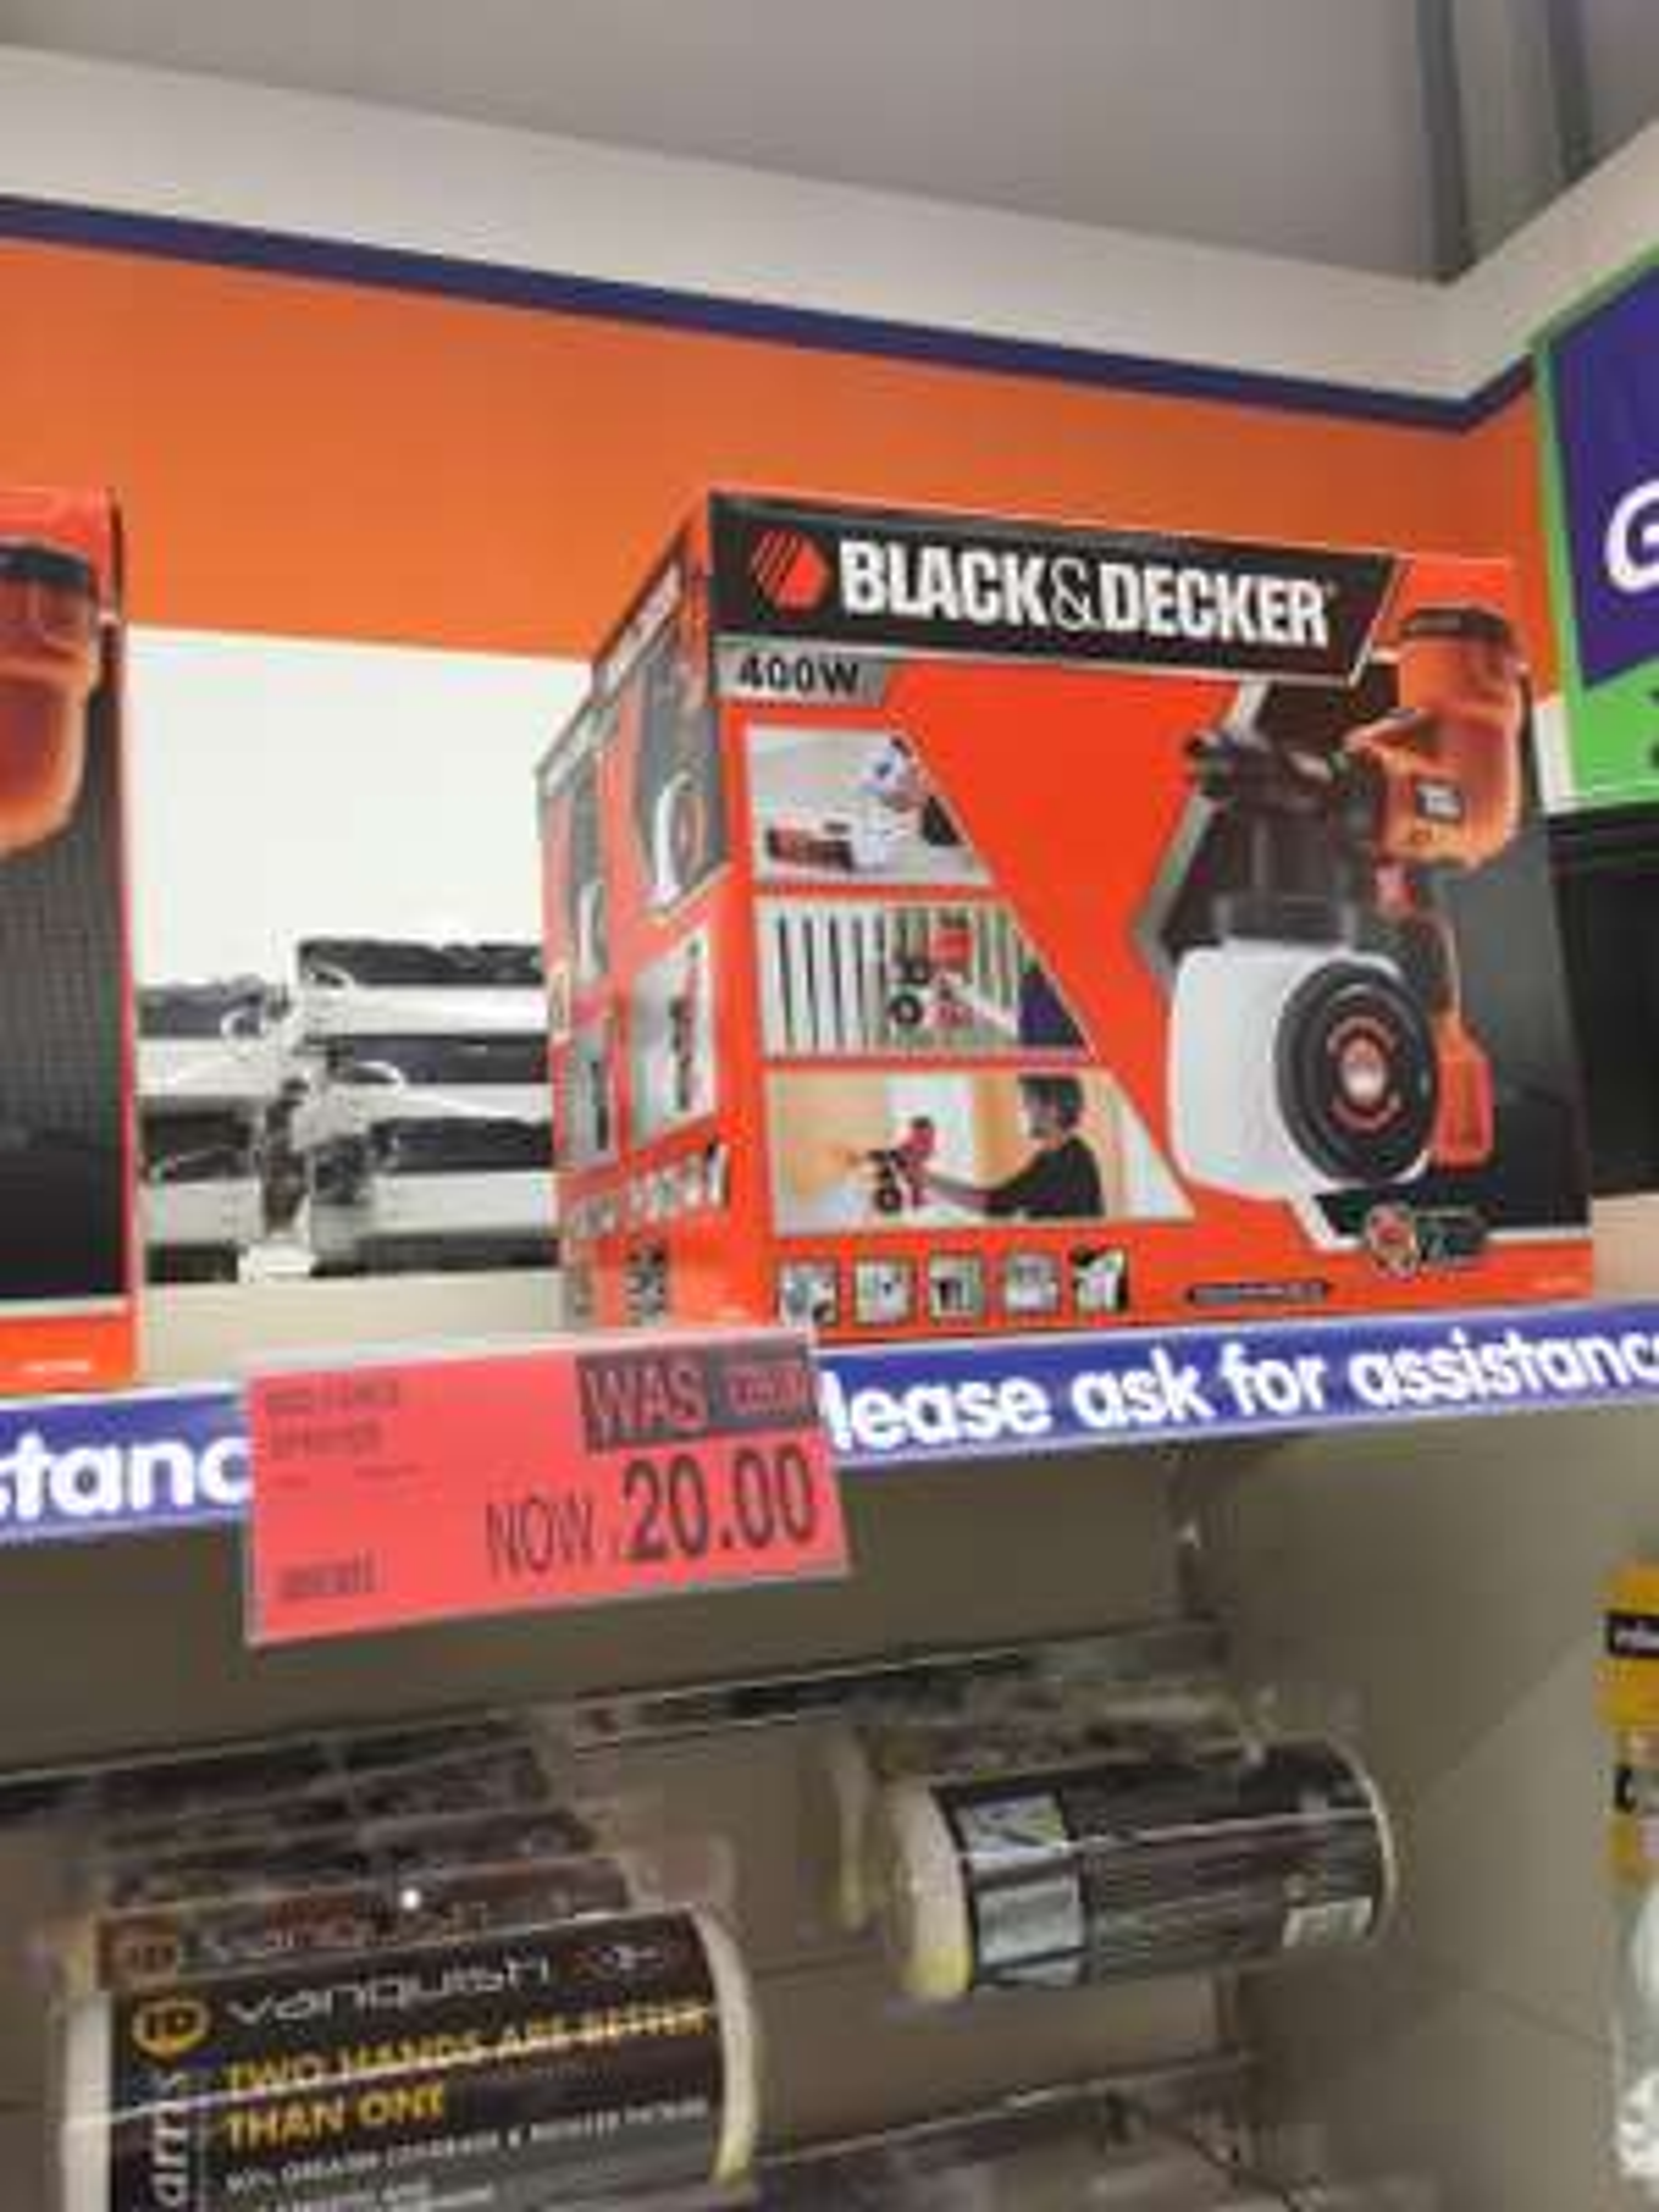 Black & Decker HVLP200 Fence Sprayer £20 Instore B&M